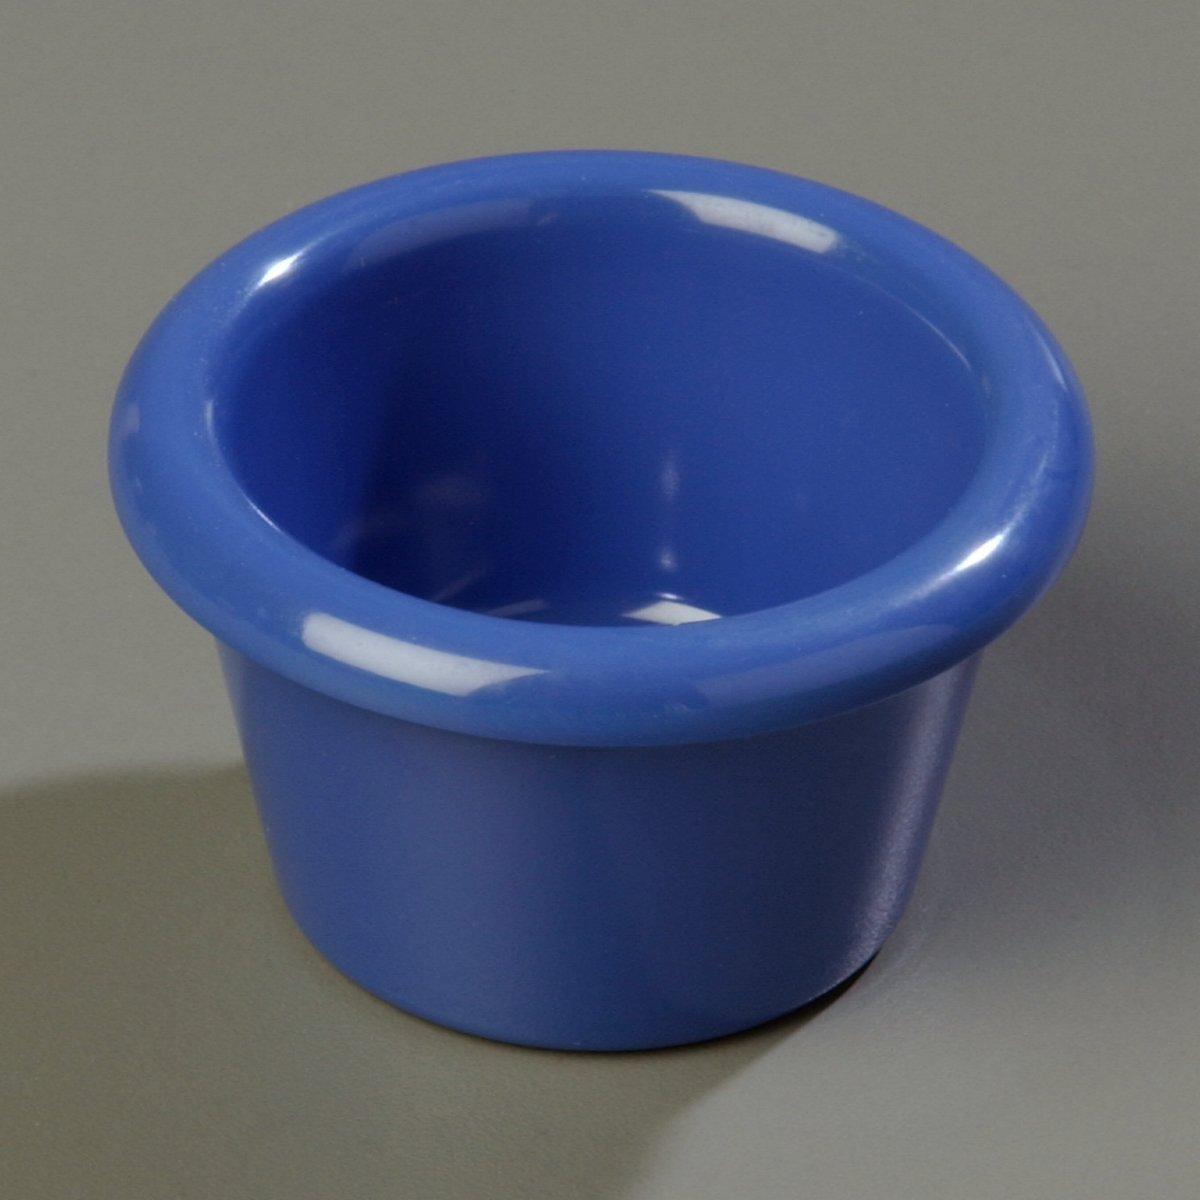 Case of 48 Carlisle S27514 Melamine Smooth Ramekin Capacity Ocean Blue 1.5 oz